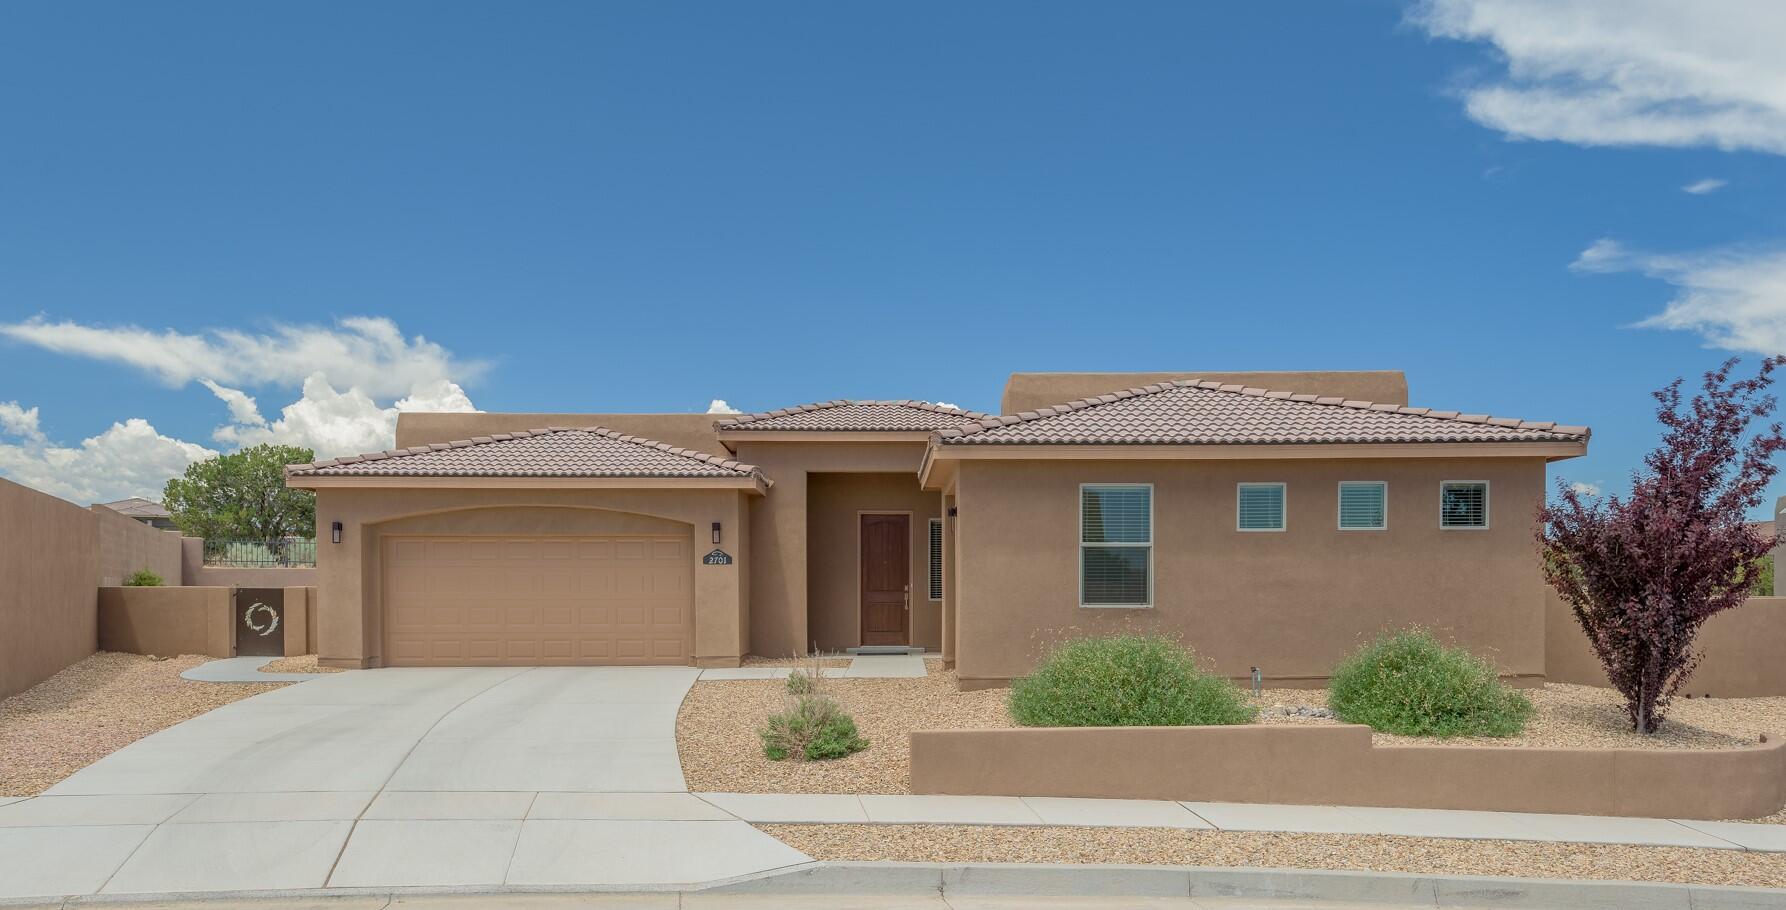 2701 Redondo Santa Fe Ne Property Photo